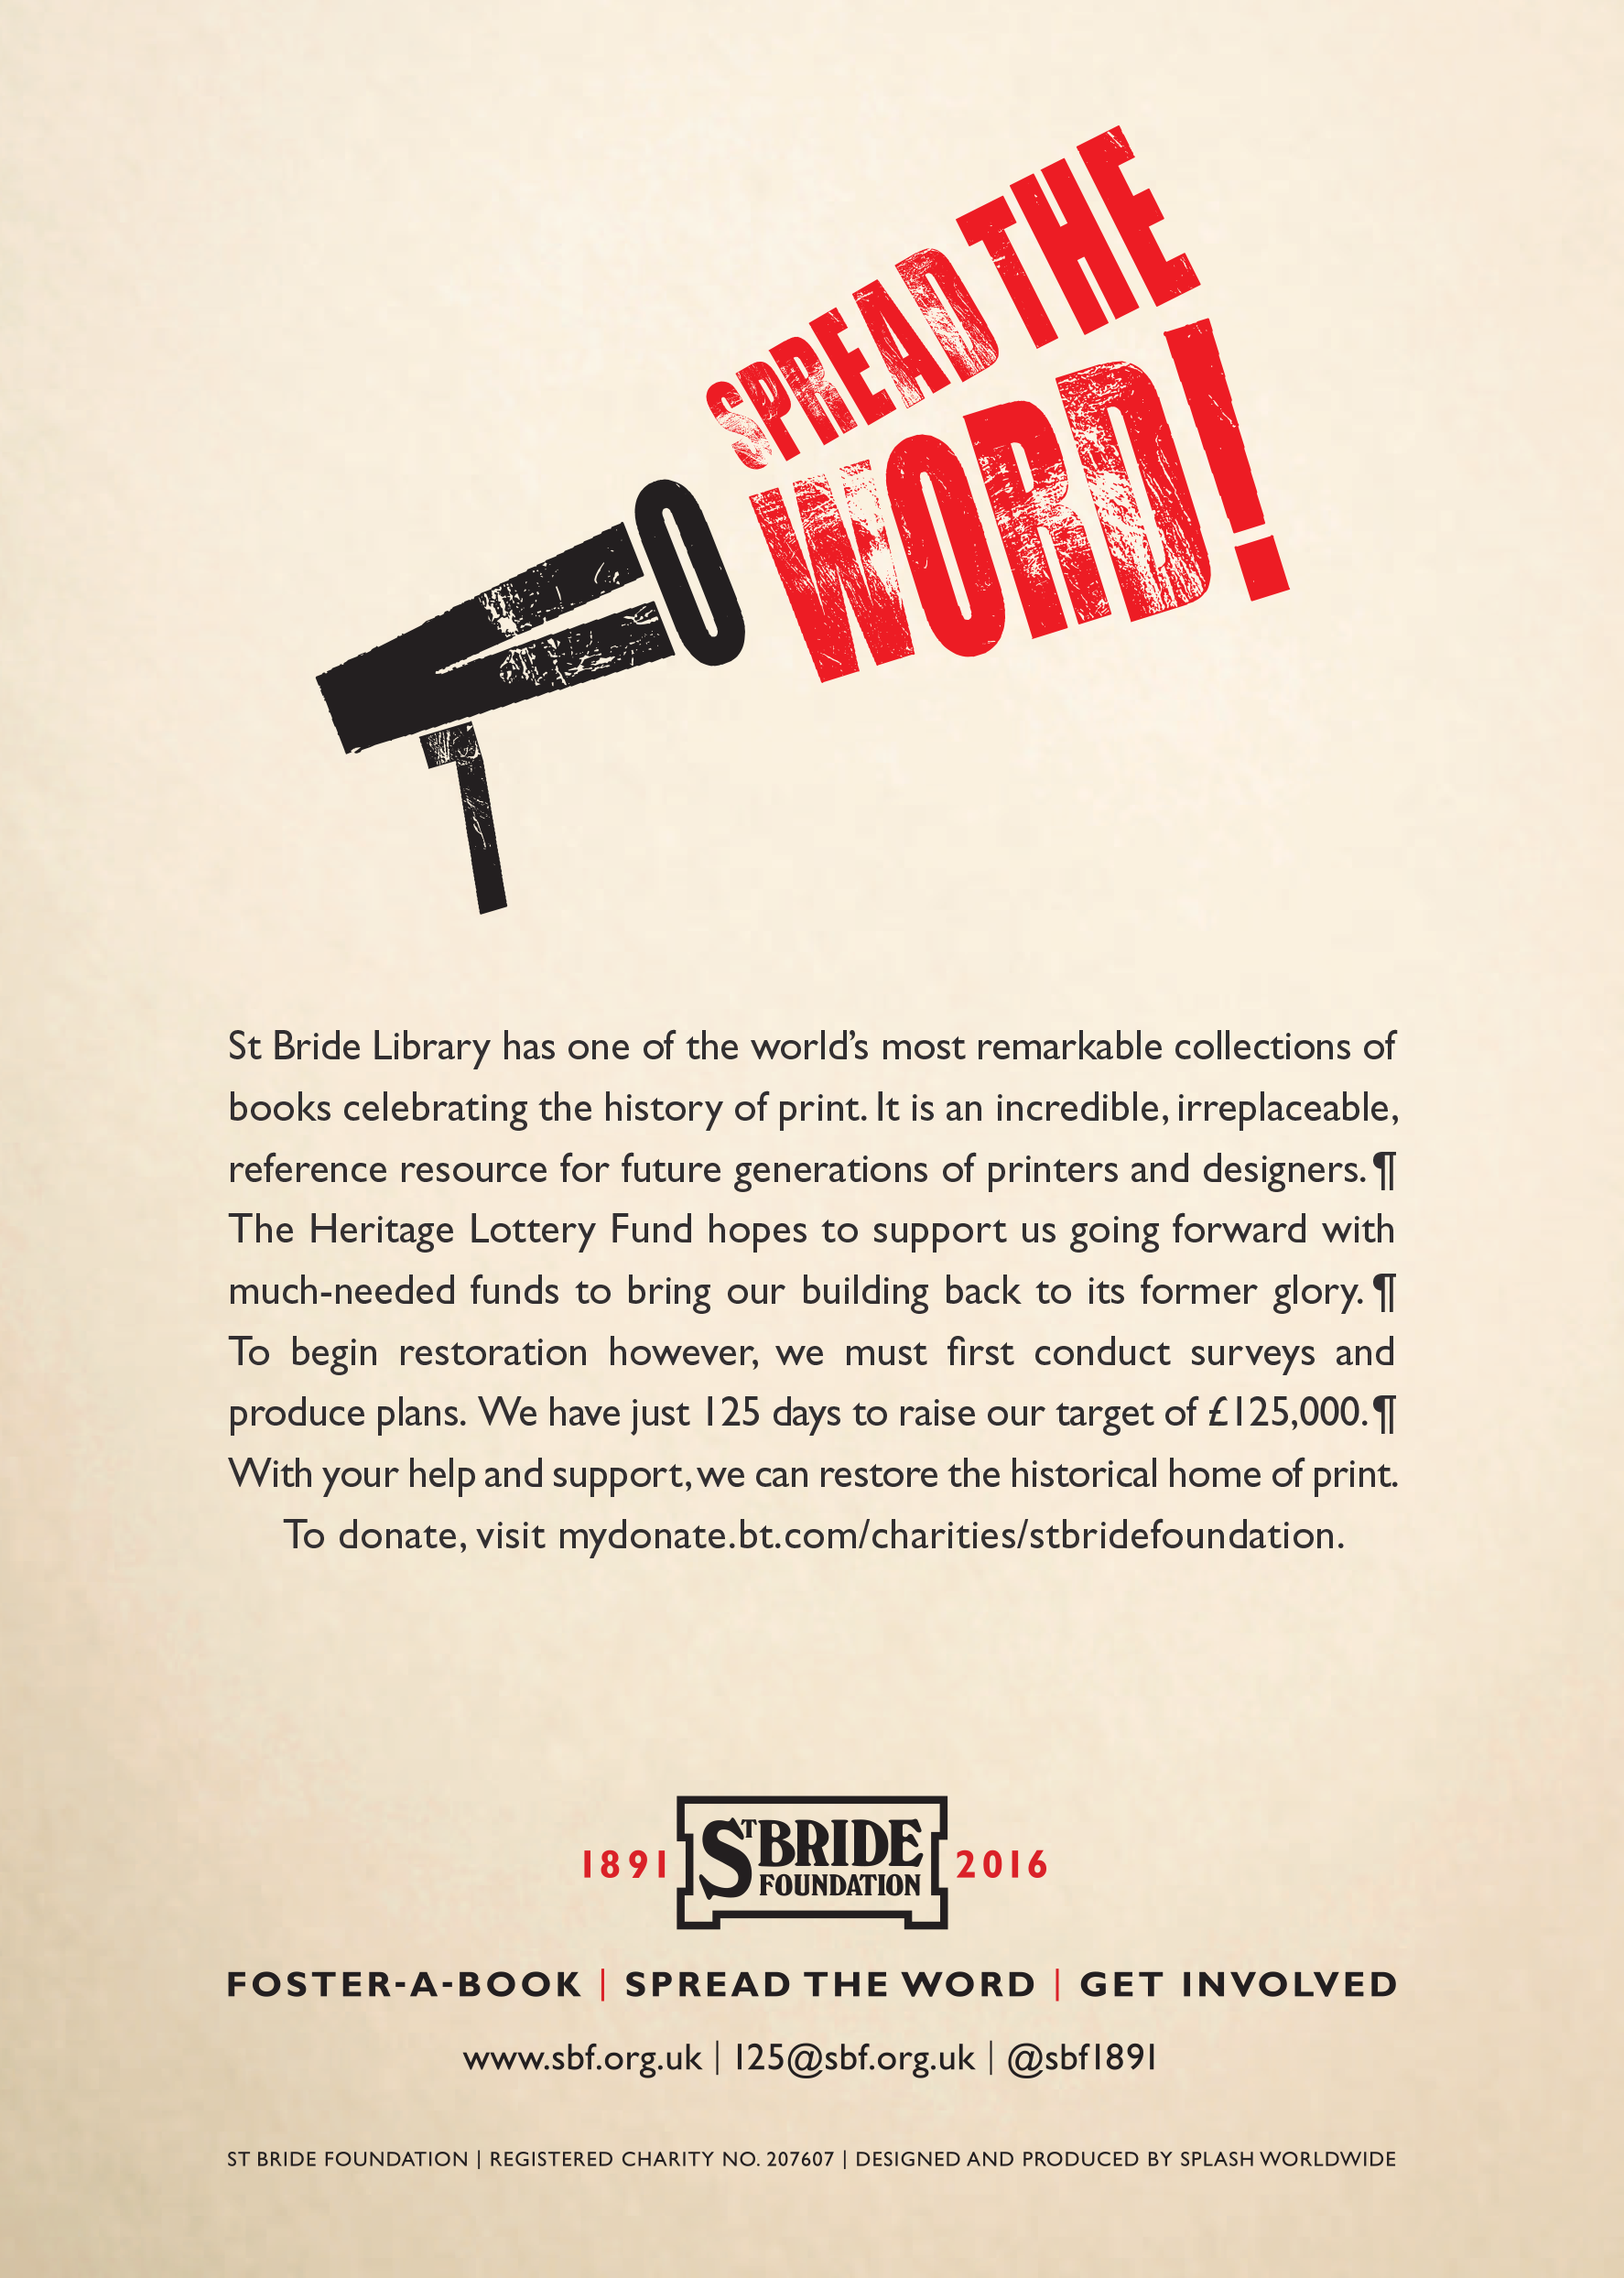 St Bride Foundation Poster 2